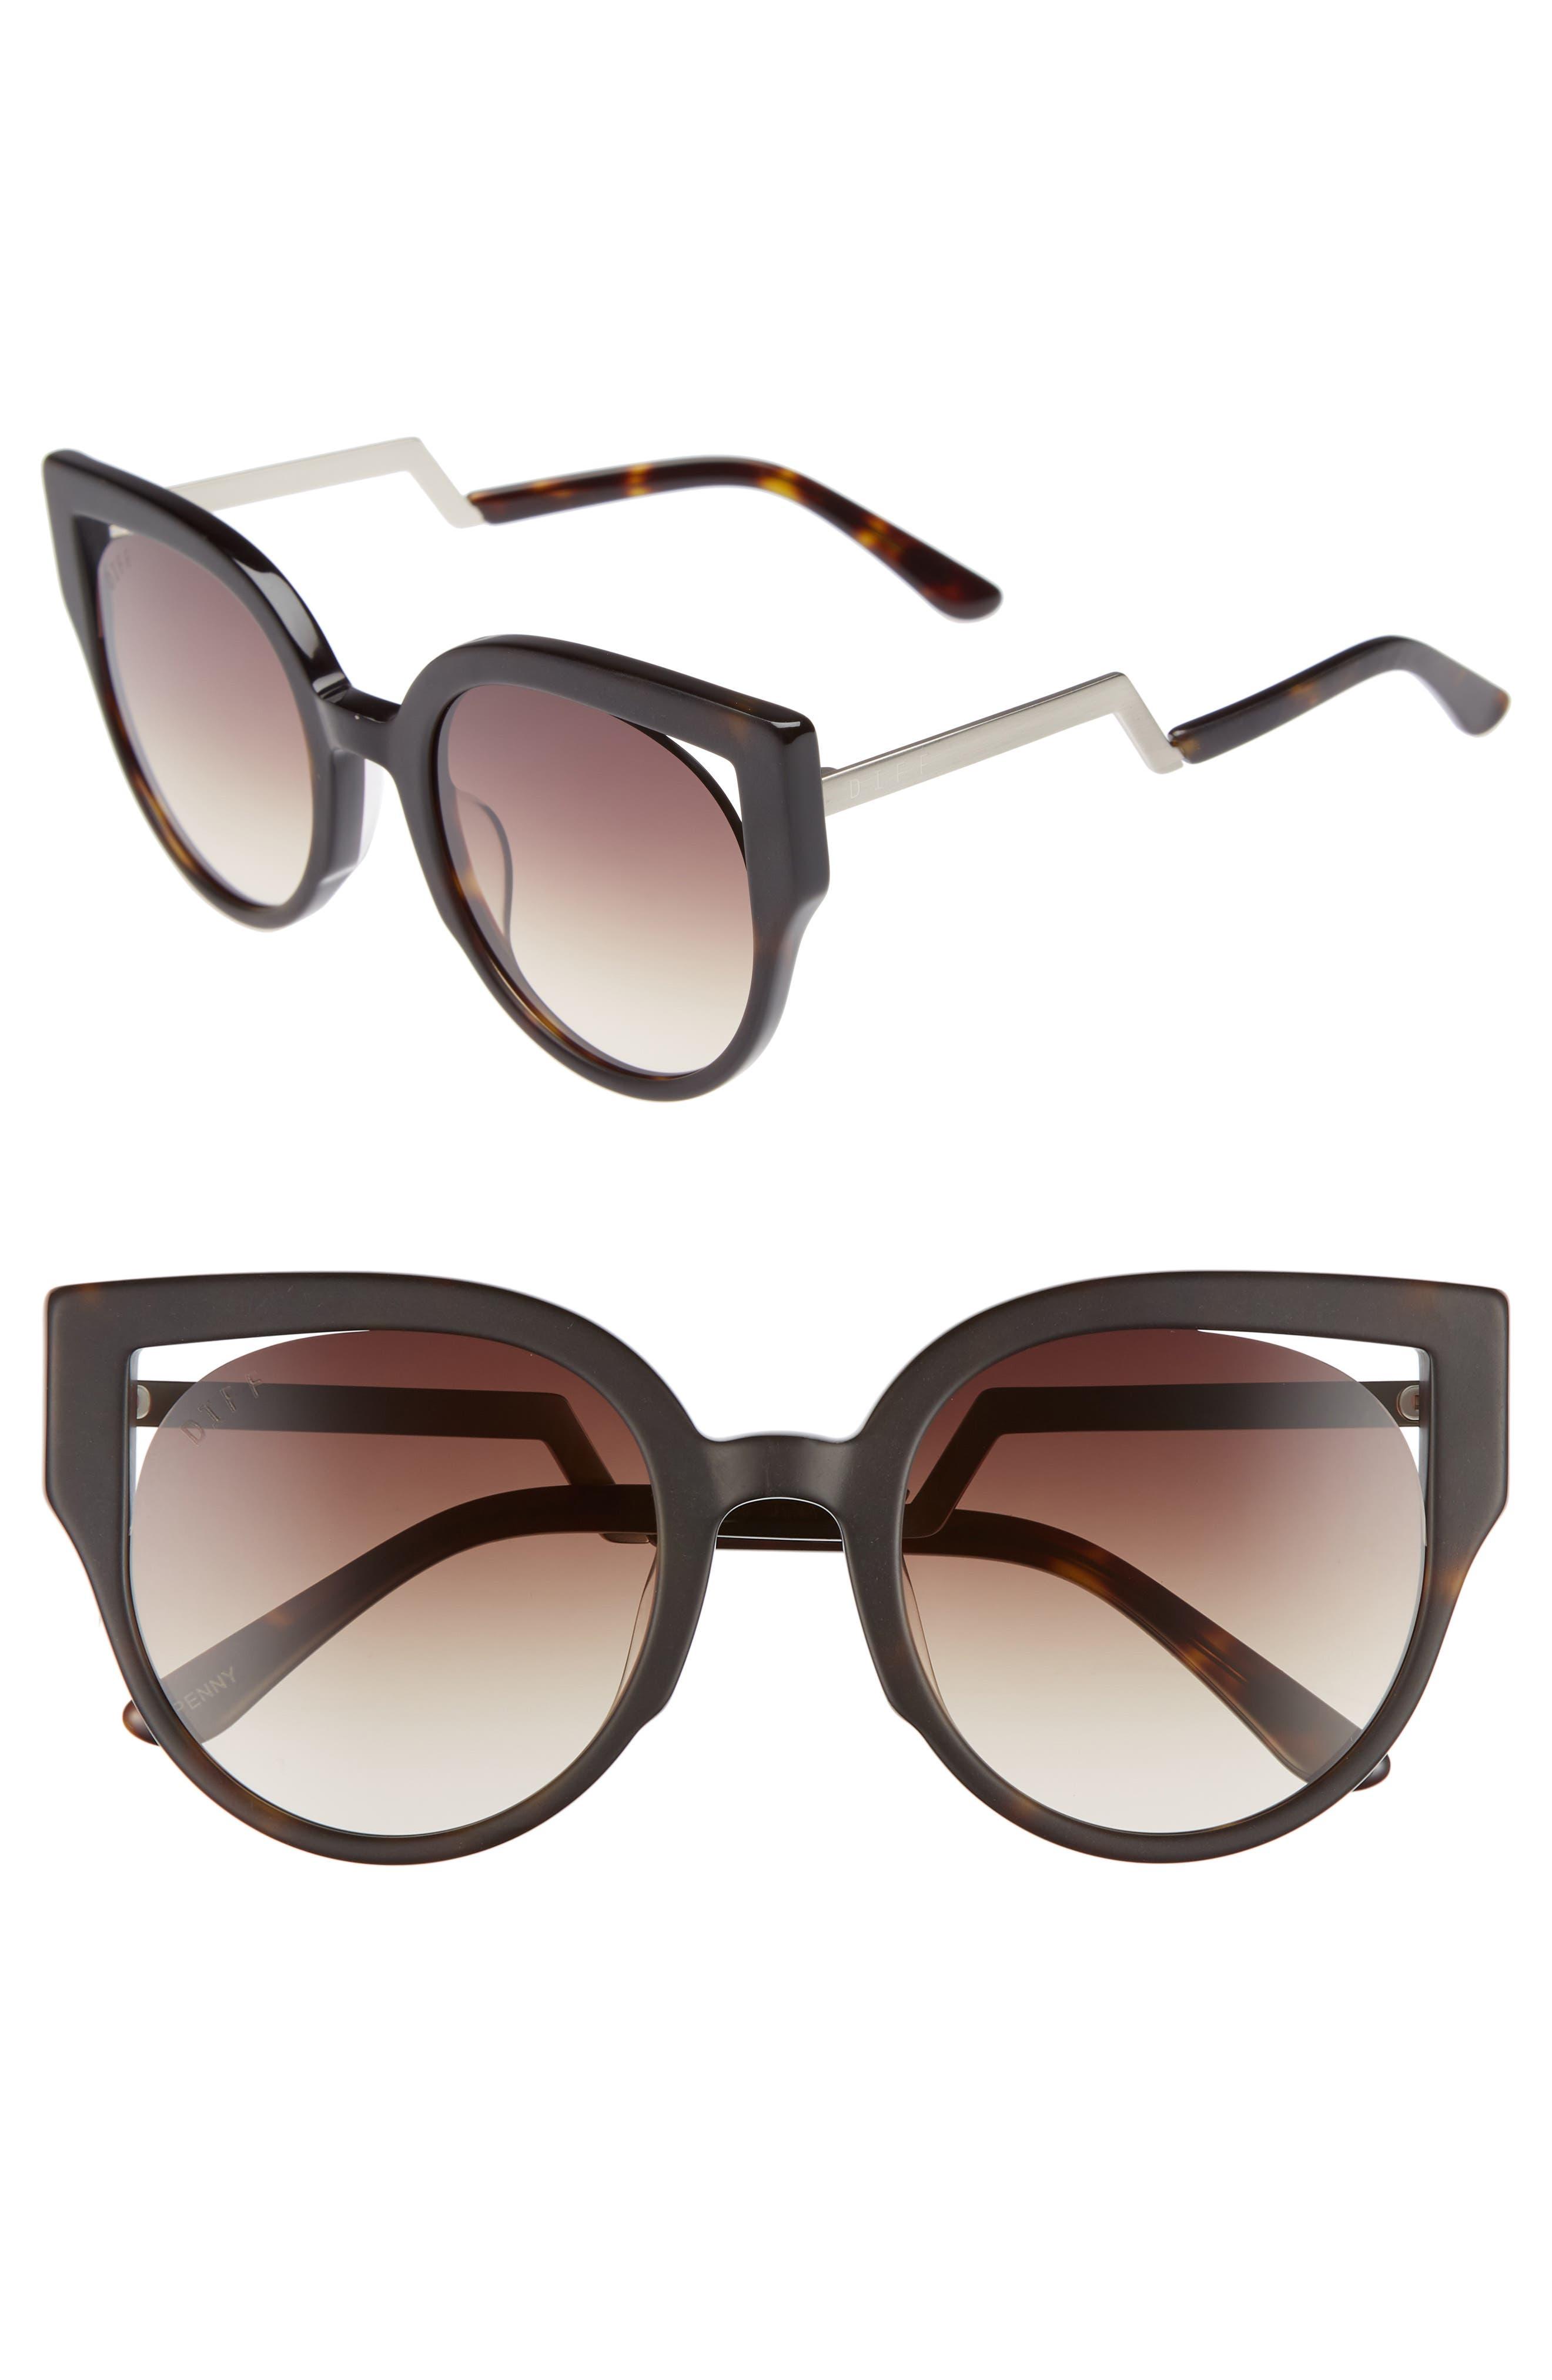 Penny 55mm Cat Eye Sunglasses,                             Main thumbnail 1, color,                             MATTE TORTOISE/ BROWN